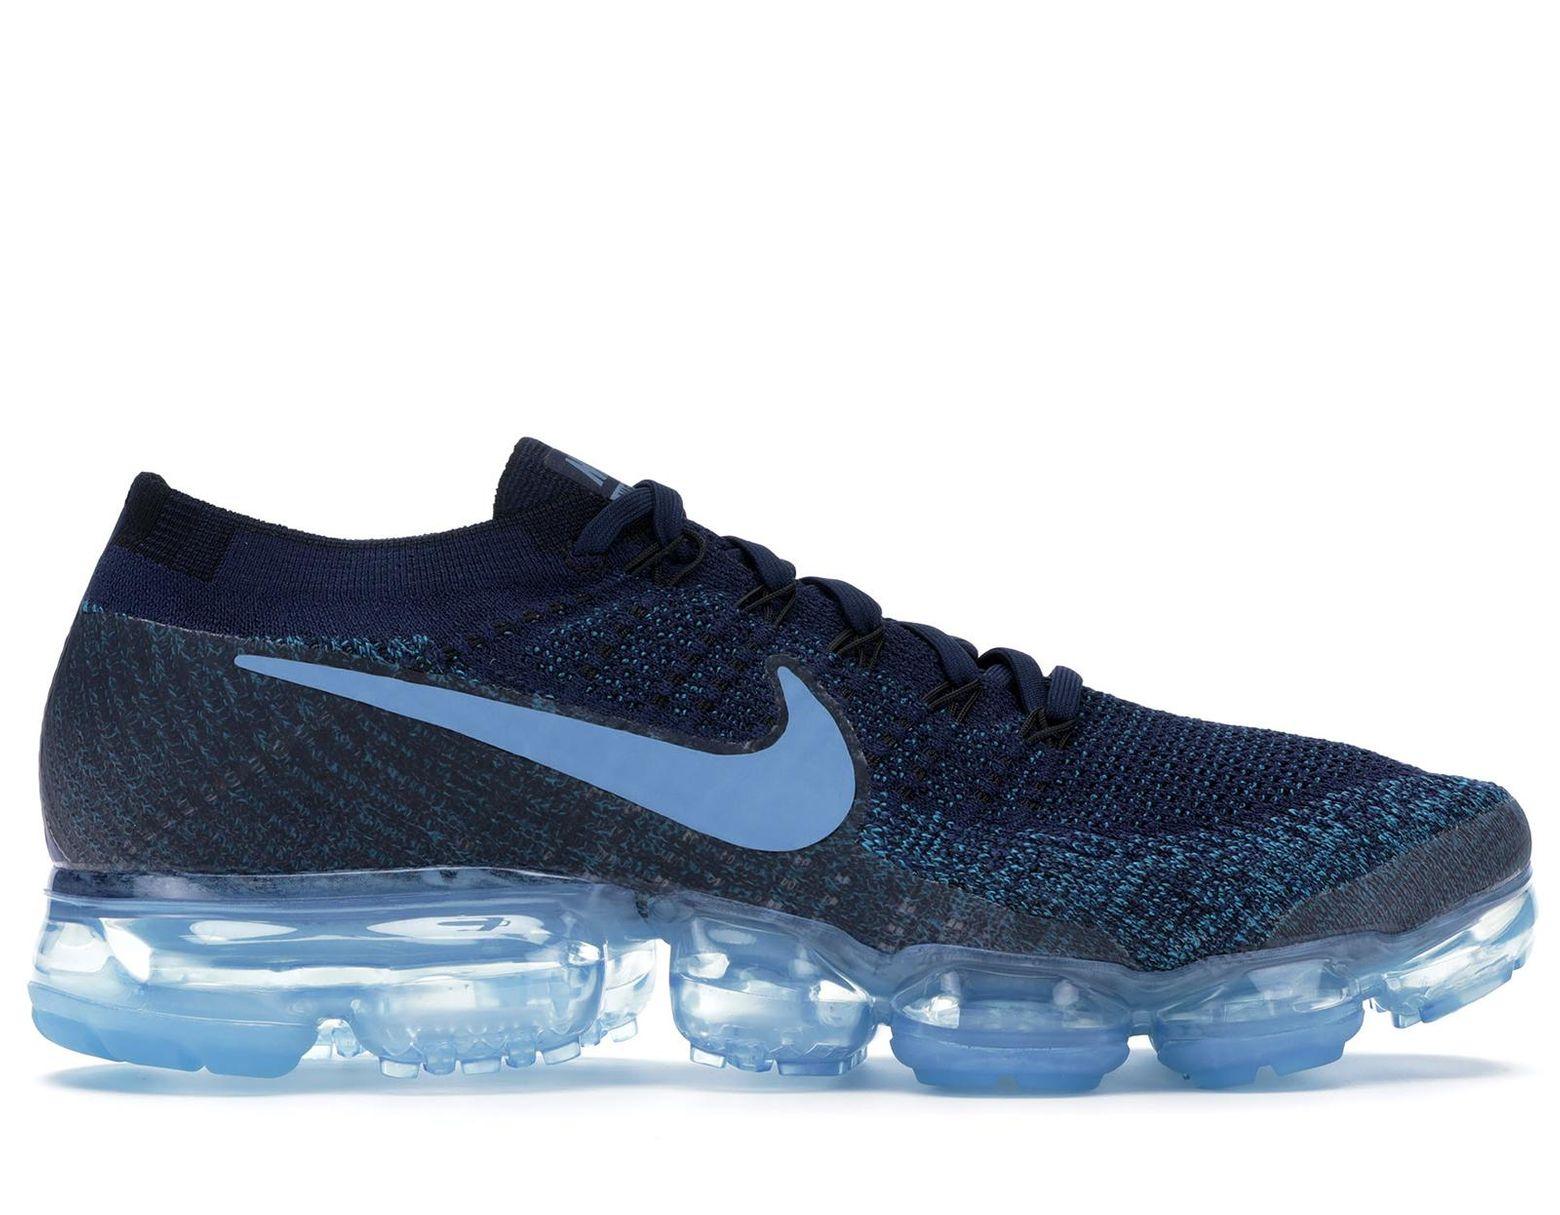 sports shoes c2765 9fcf0 Men's Air Vapormax Jd Sports Ice Blue